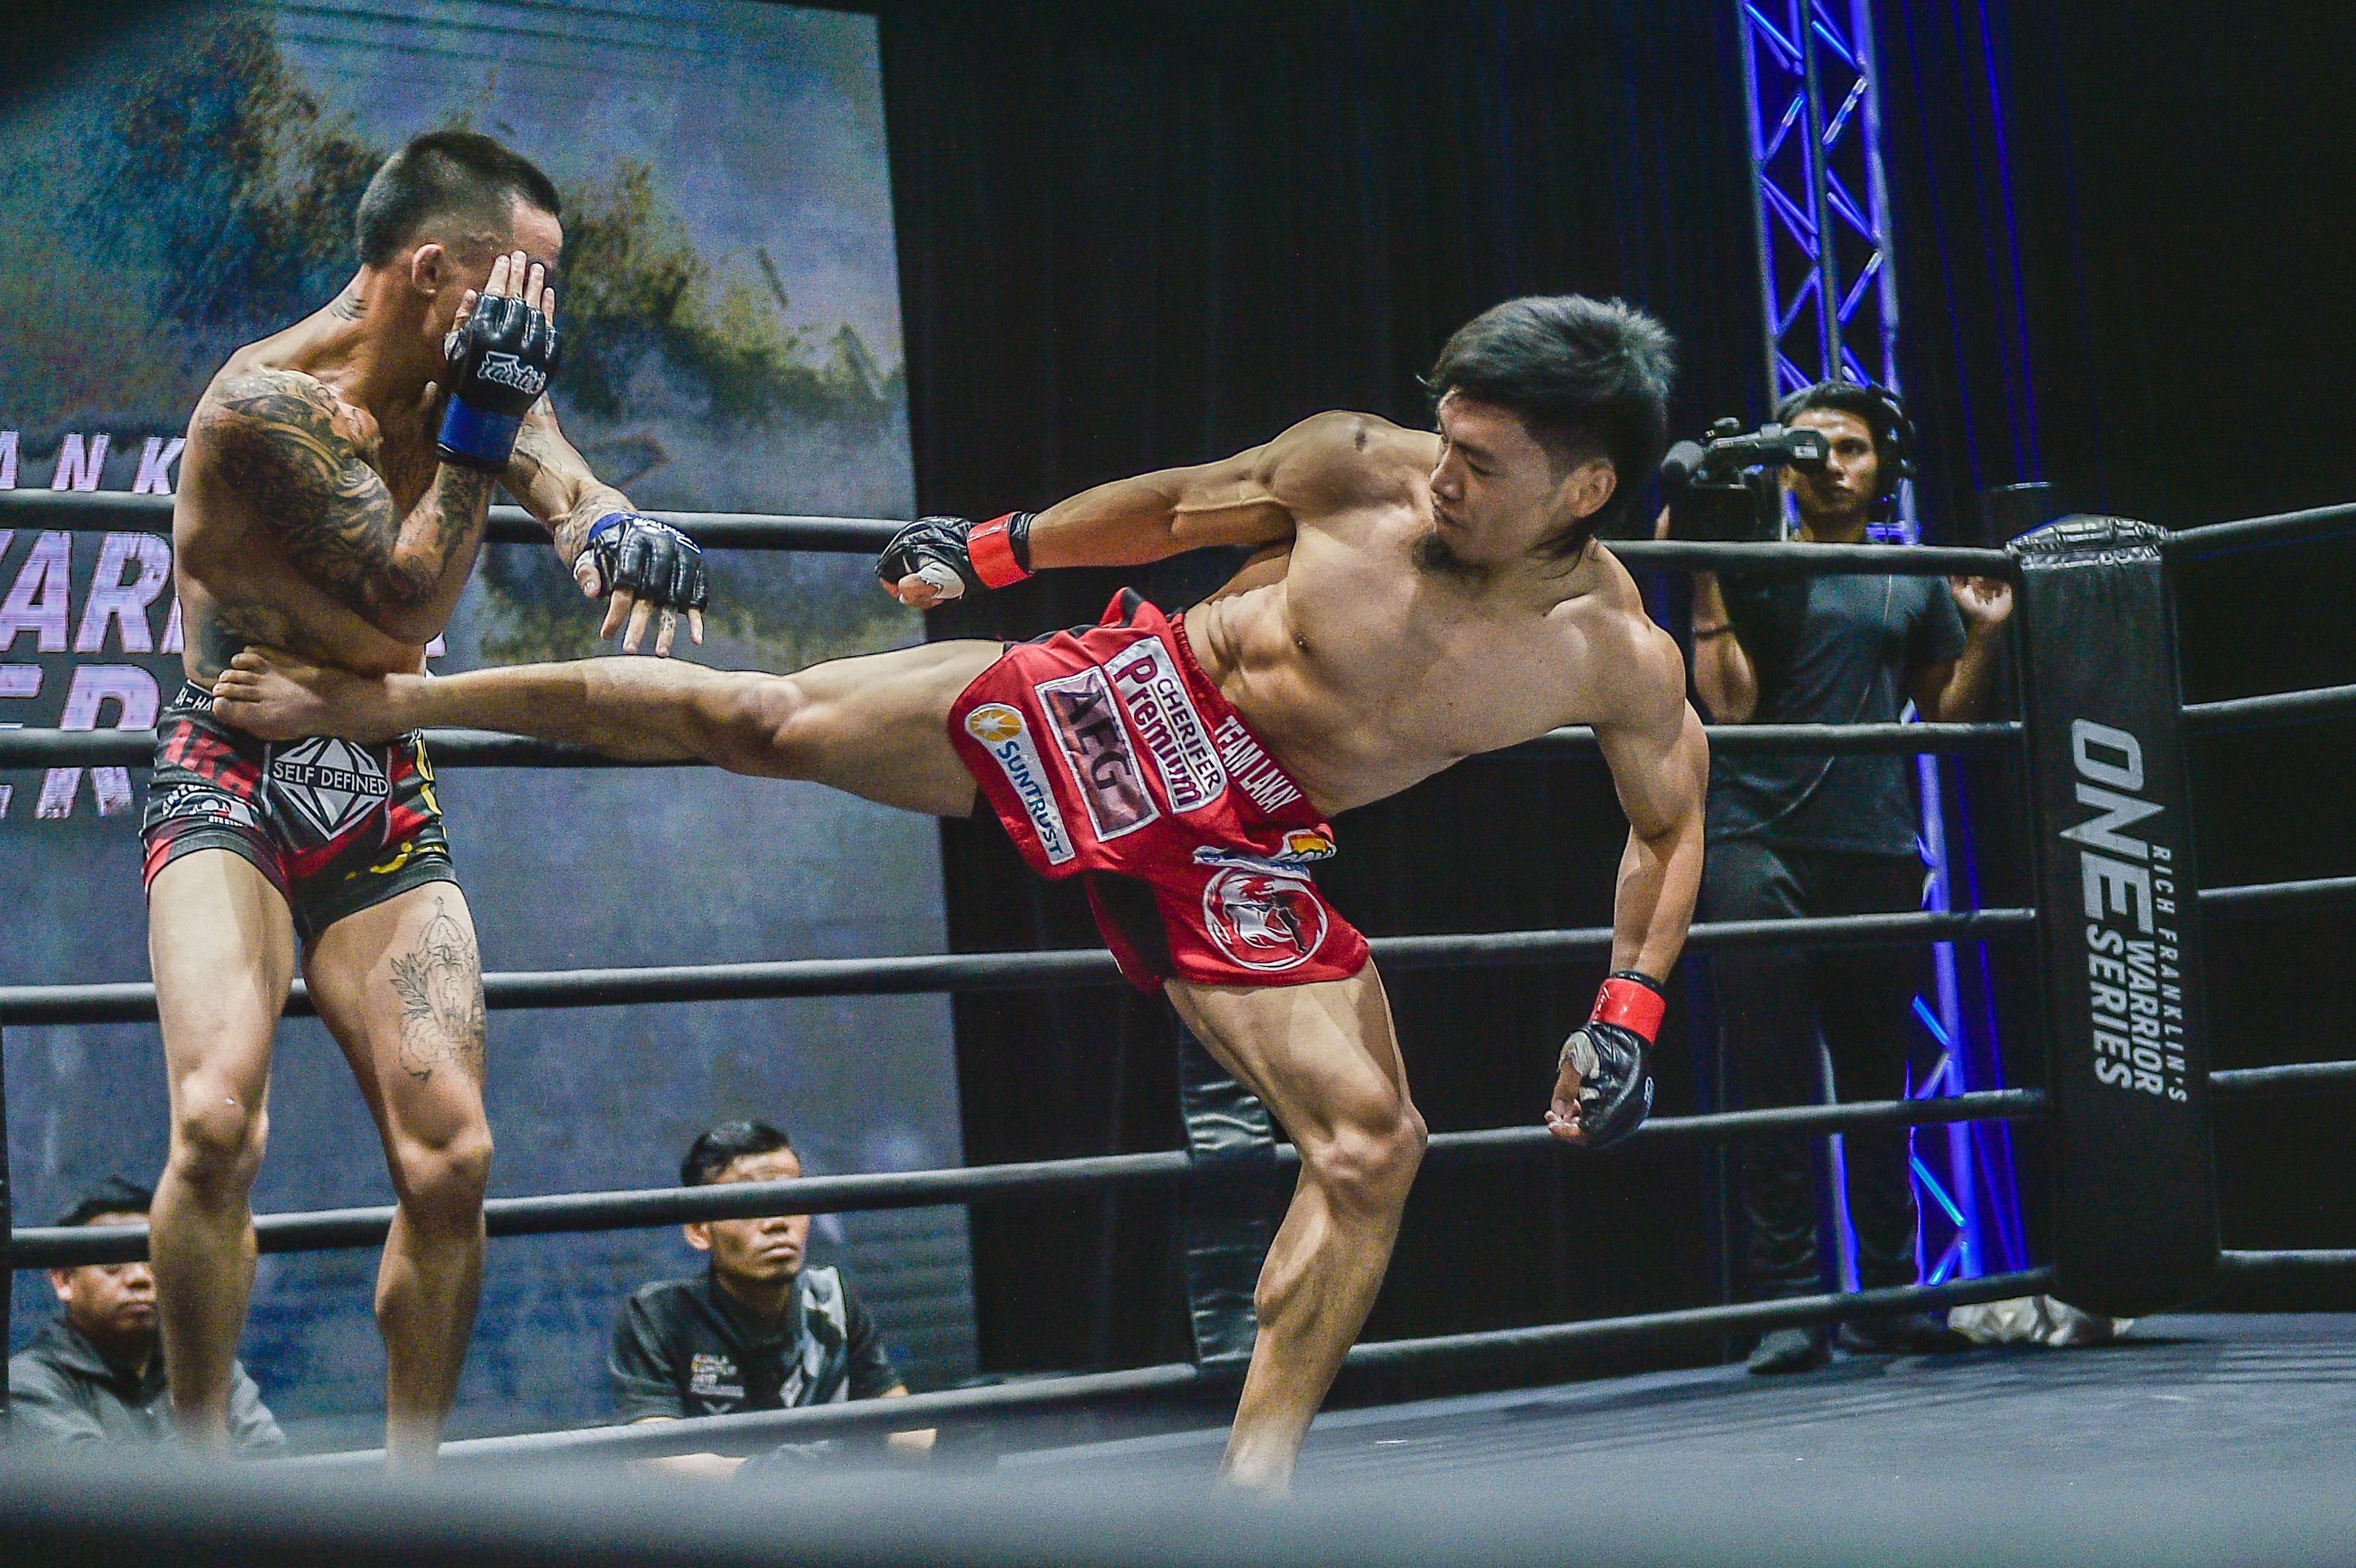 ONE Championship: Adiwang rising for Team Lakay